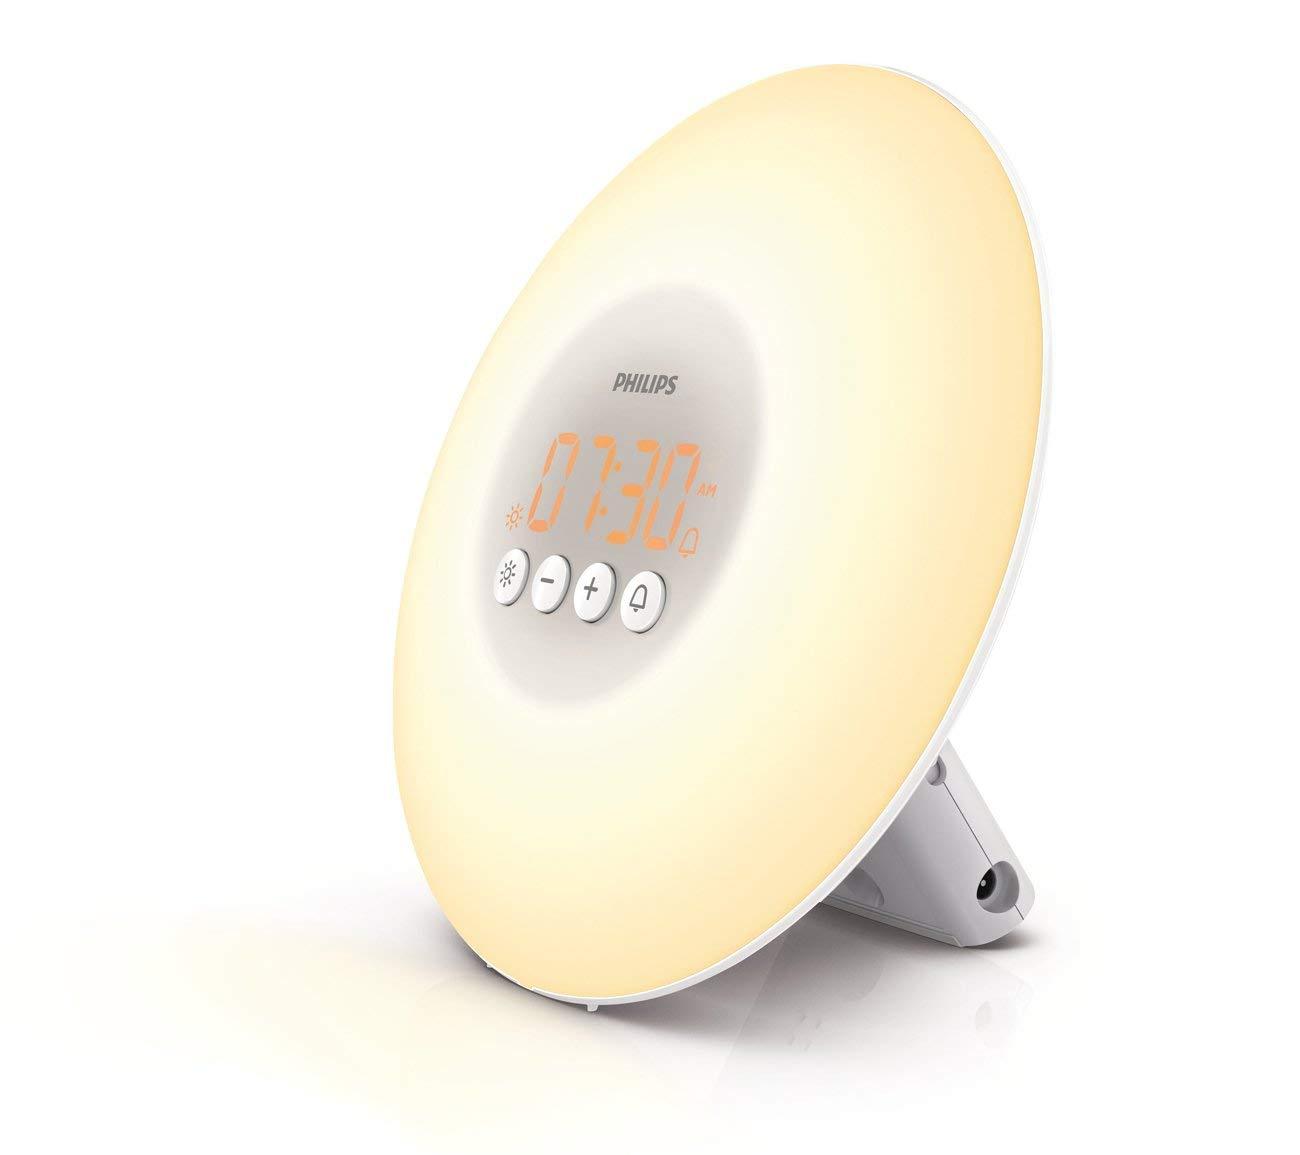 Image result for Philips Wake-Up Light Alarm Clock with Sunrise Simulation, White (HF3500/60)